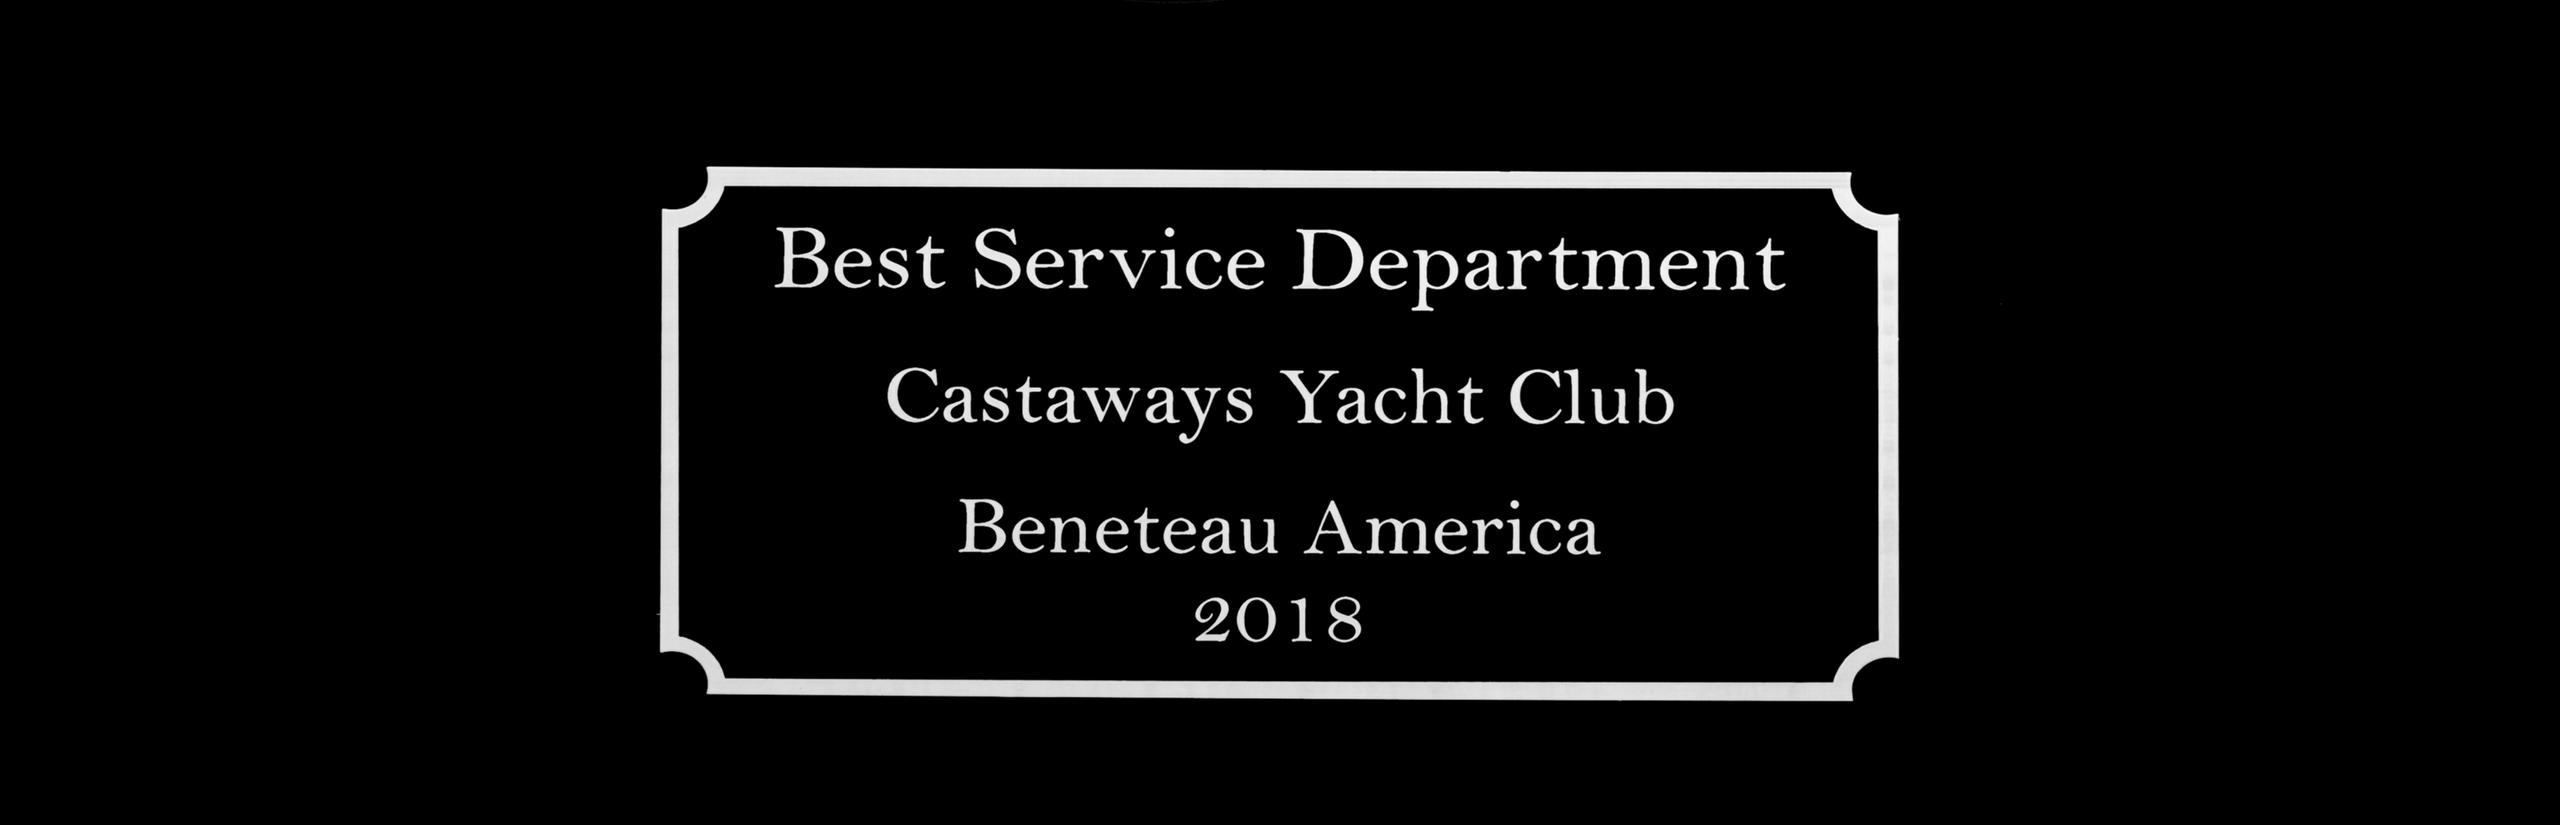 2018 Beneteau Best Service Department Award